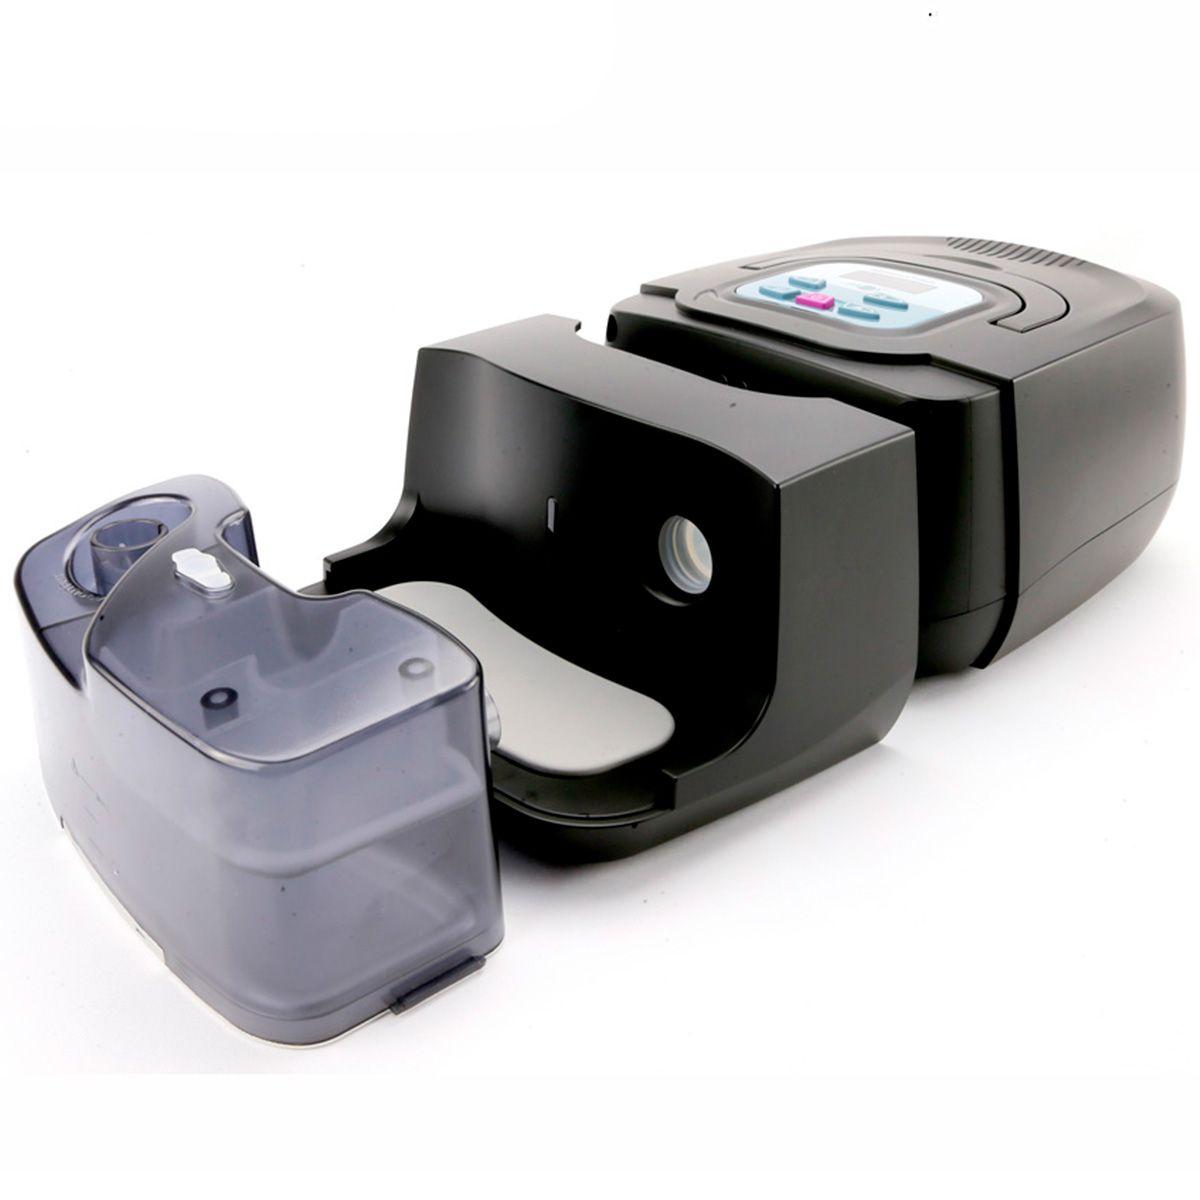 CPAP Automático RESmart com Umidificador - BMC